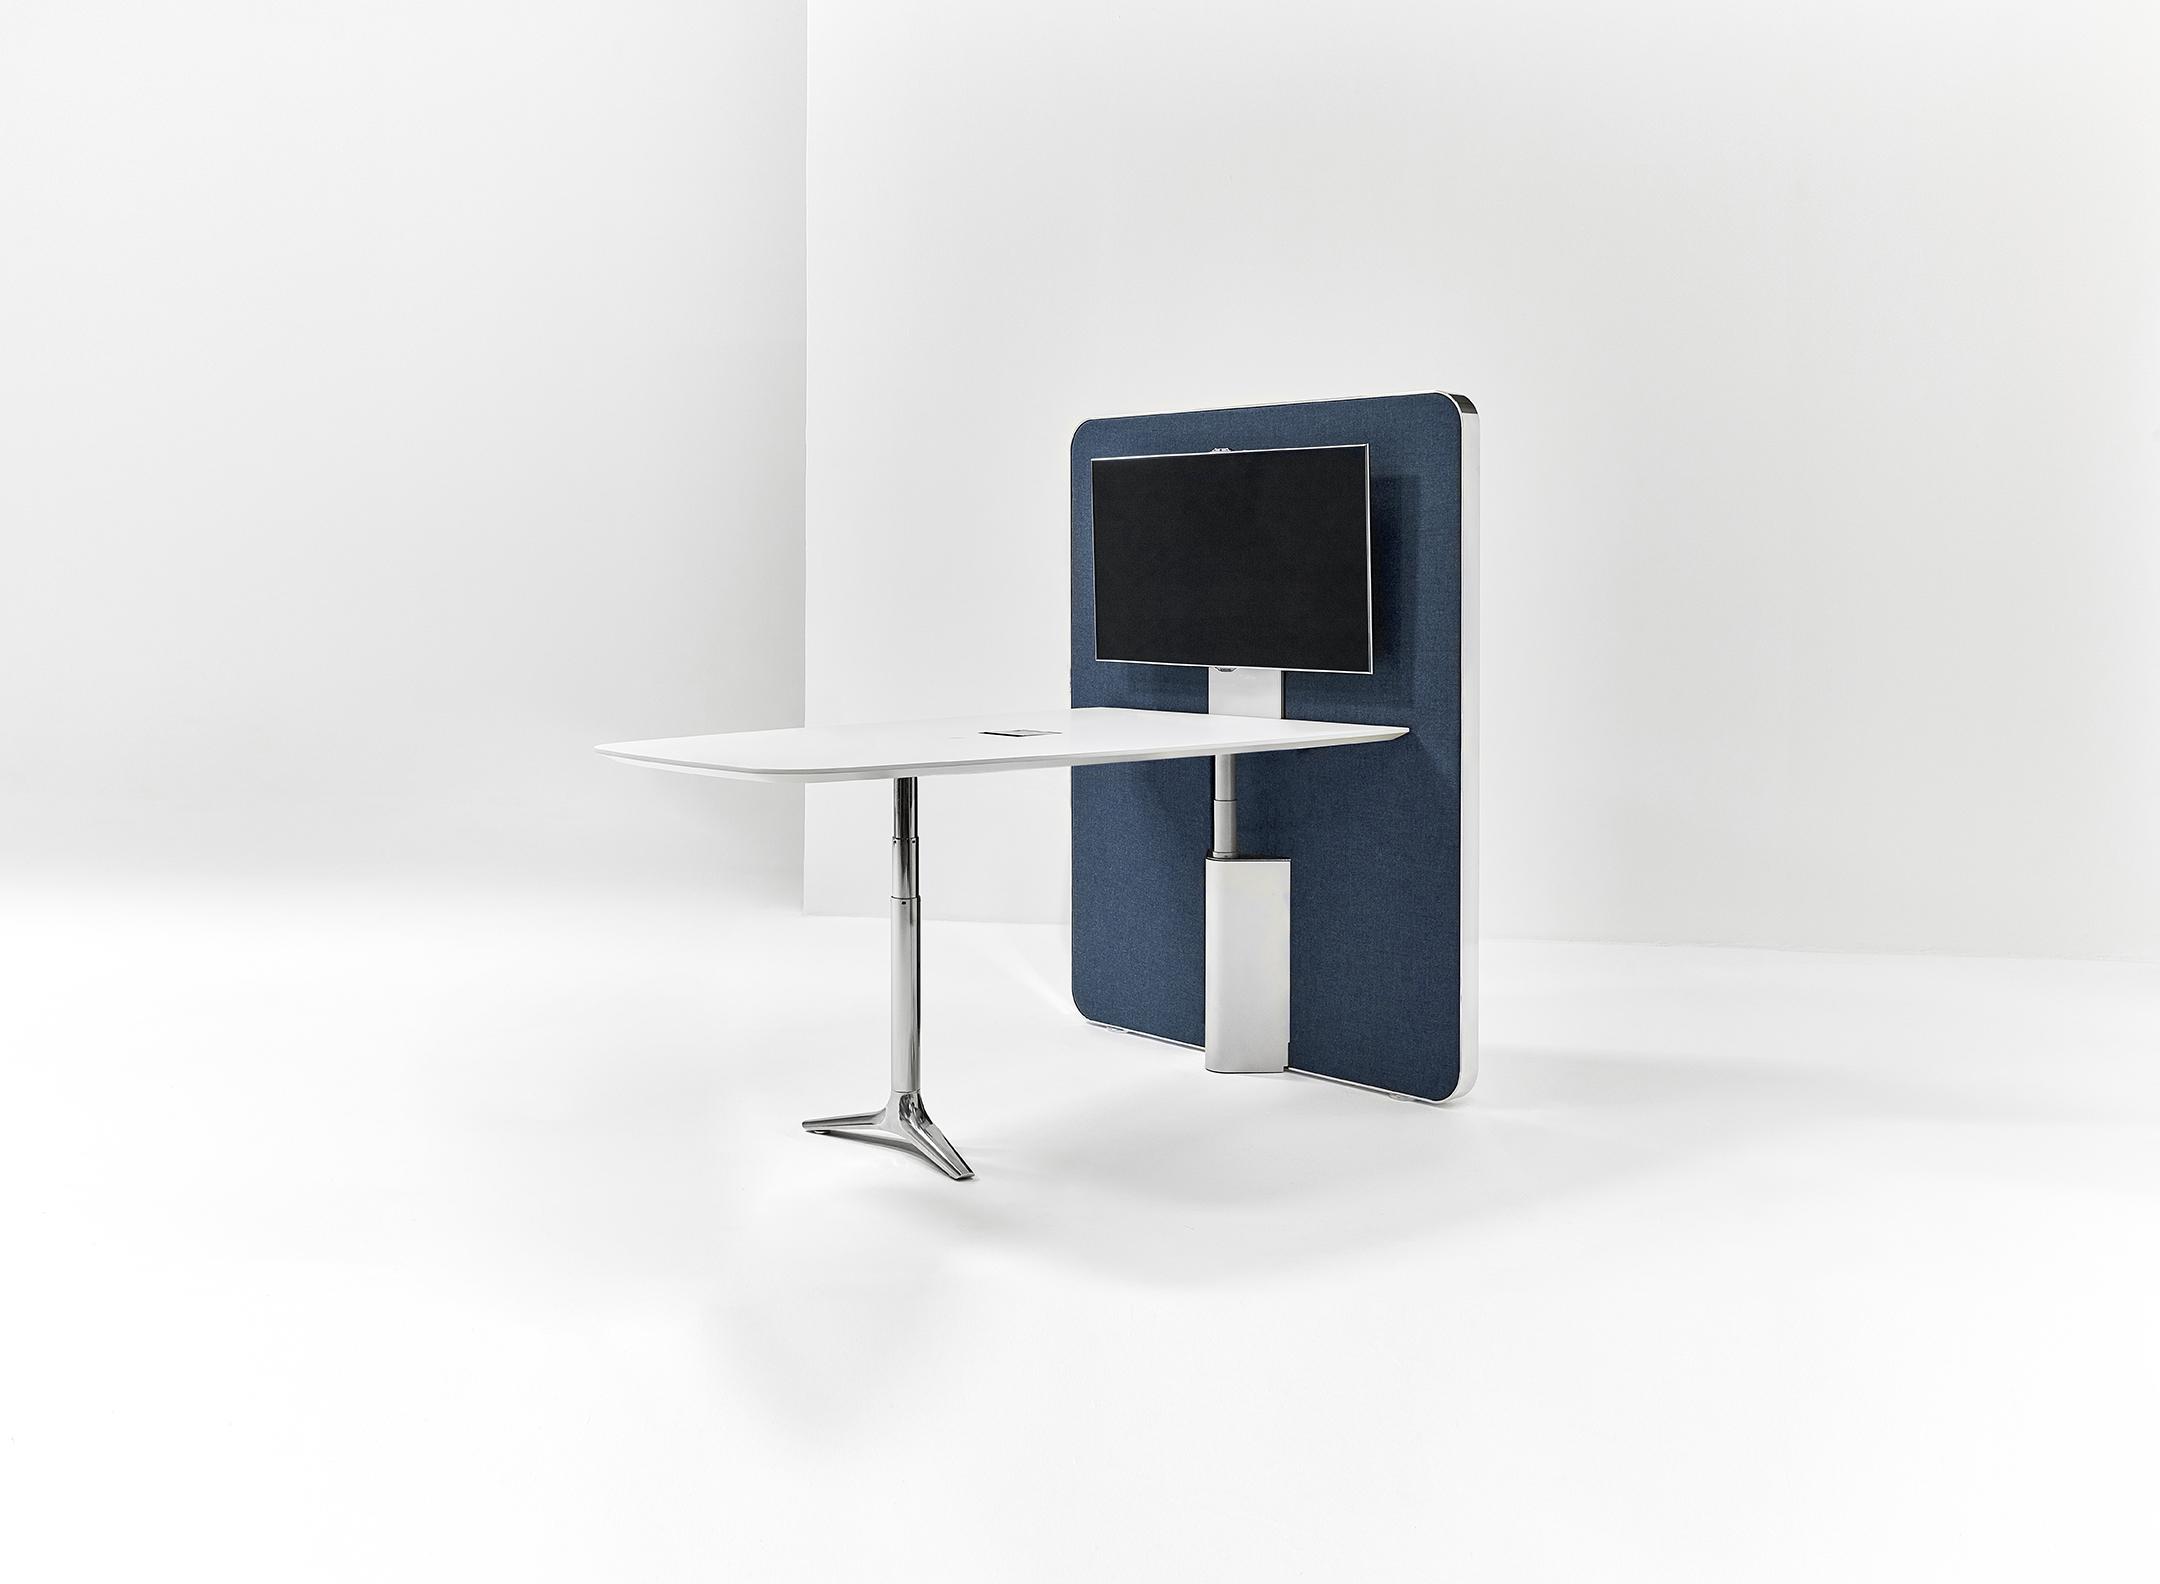 New - Gateway Hgt Adjst Table